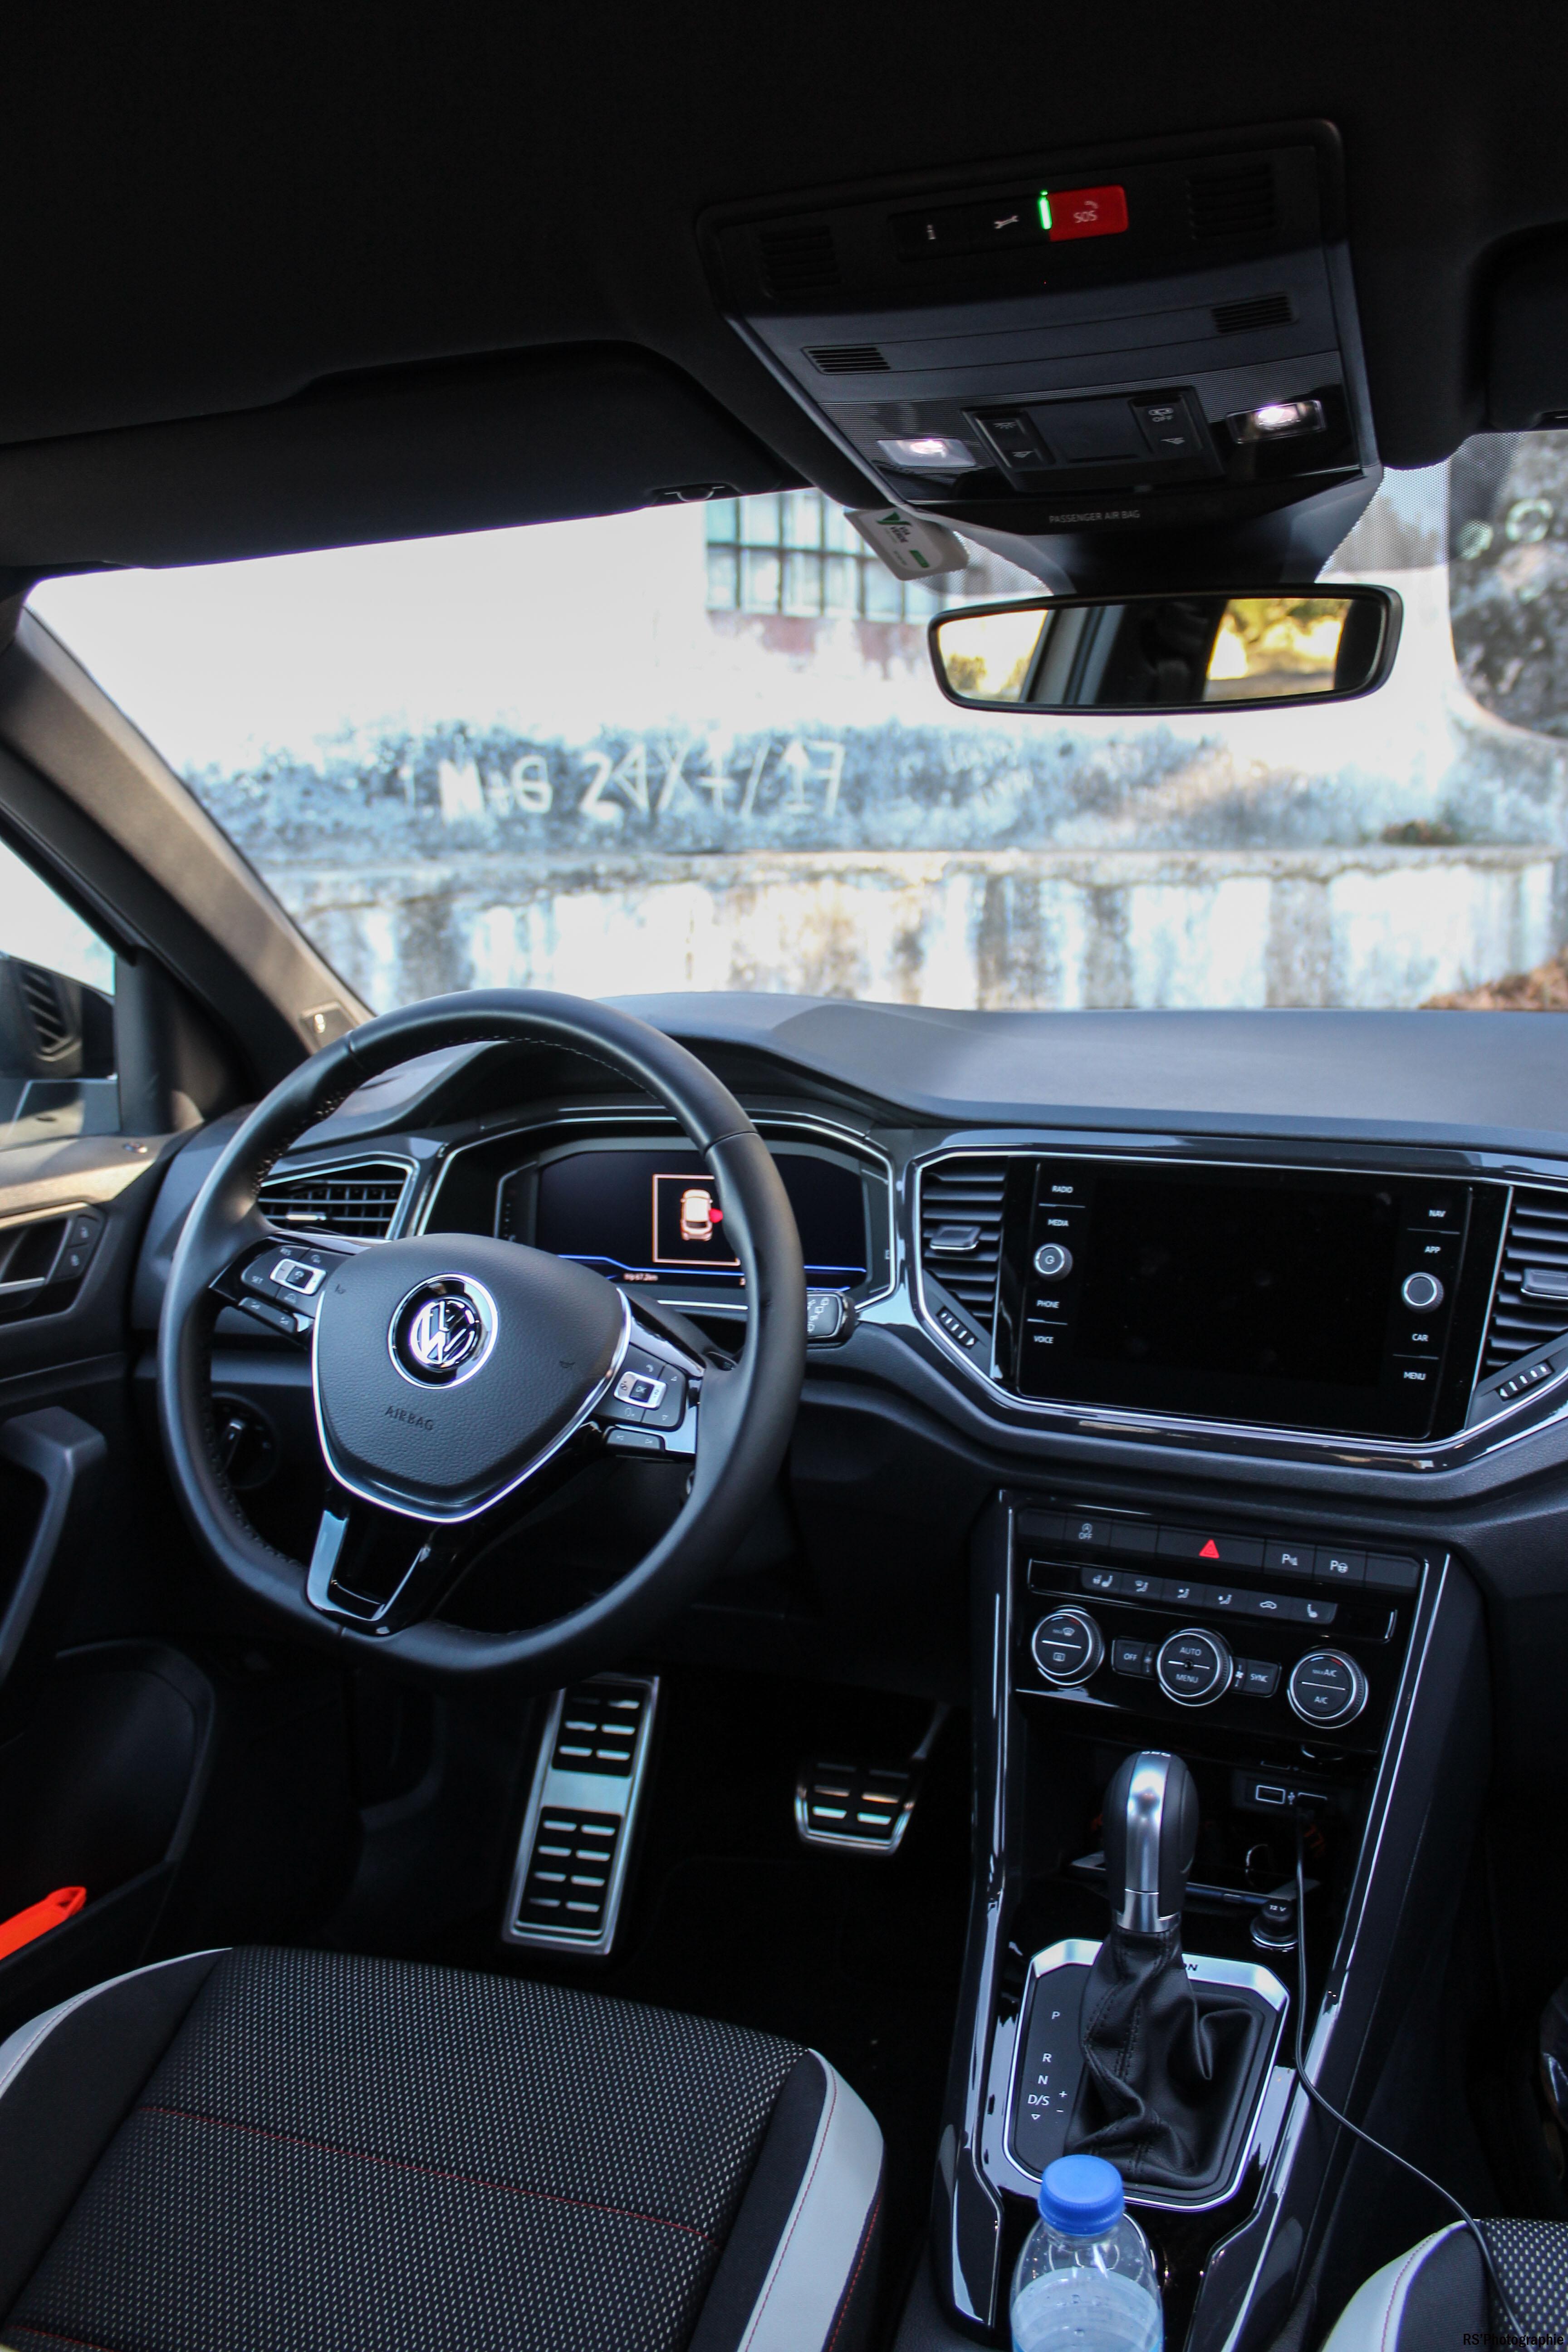 Volkswagentroc30-vw-t-roc-intérieur-onboard-Arnaud Demasier-RSPhotographie